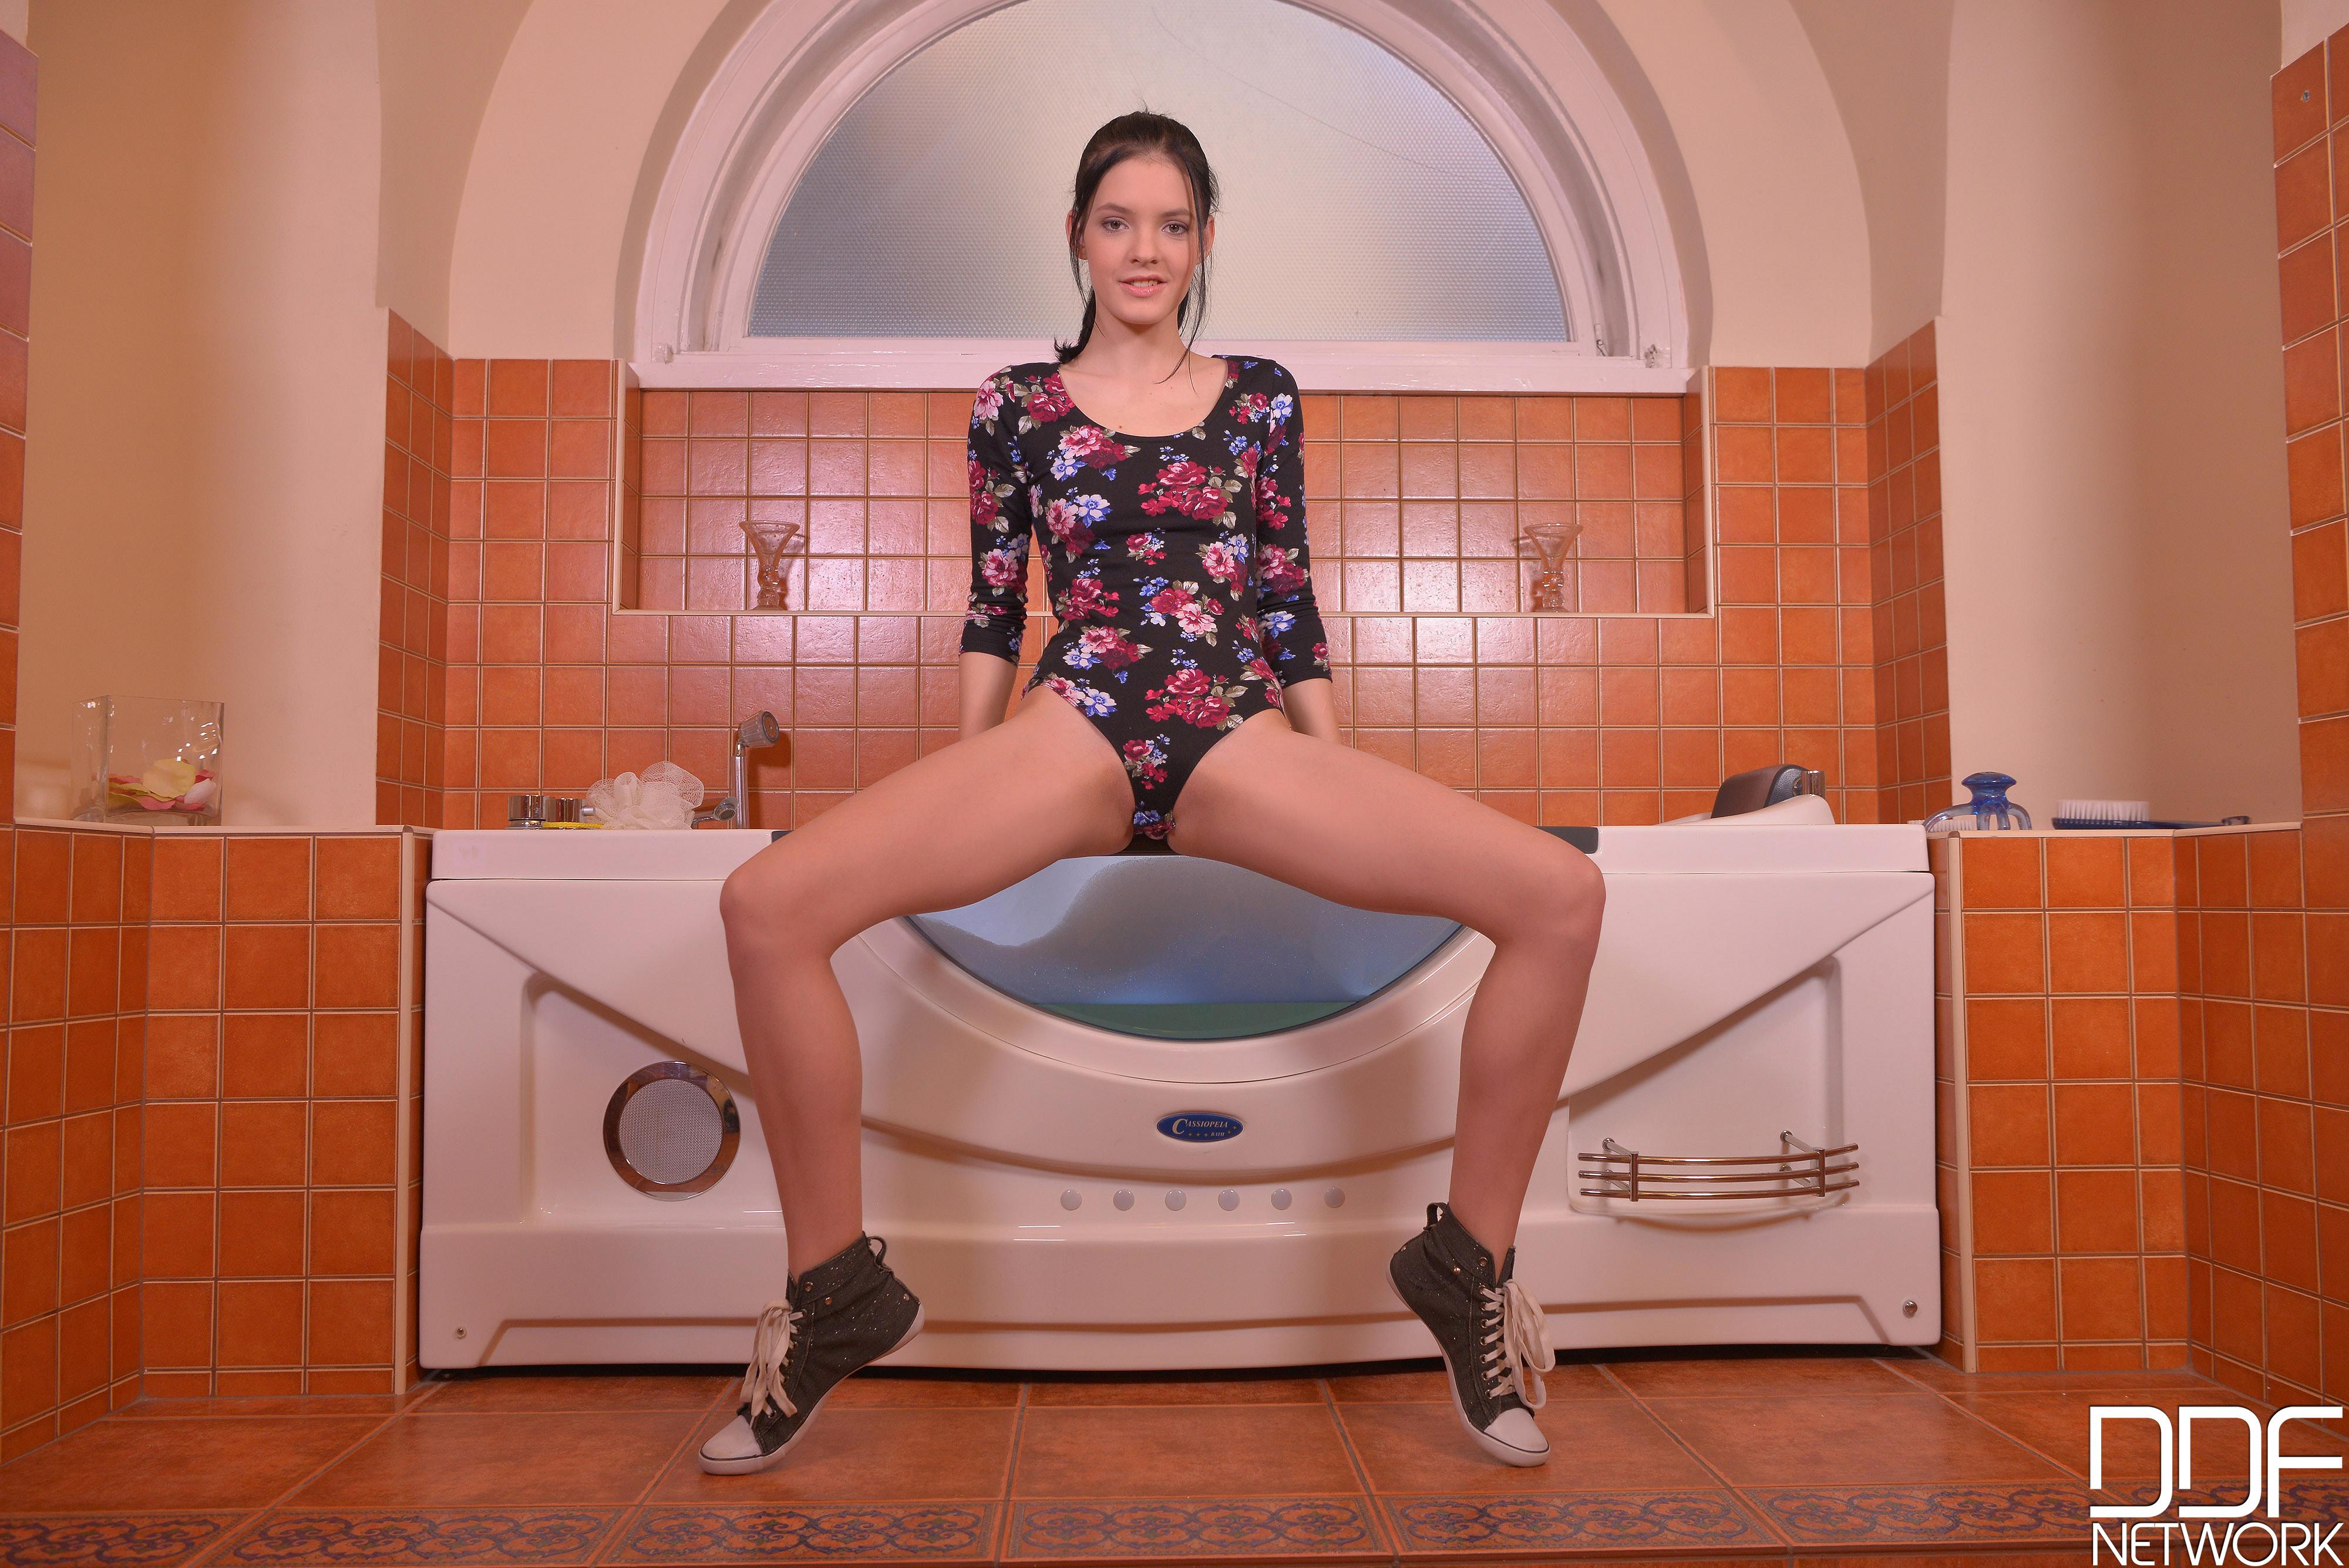 Masturbation Masterpiece - Pussy Pleasin' Bubble Bath VR Porn